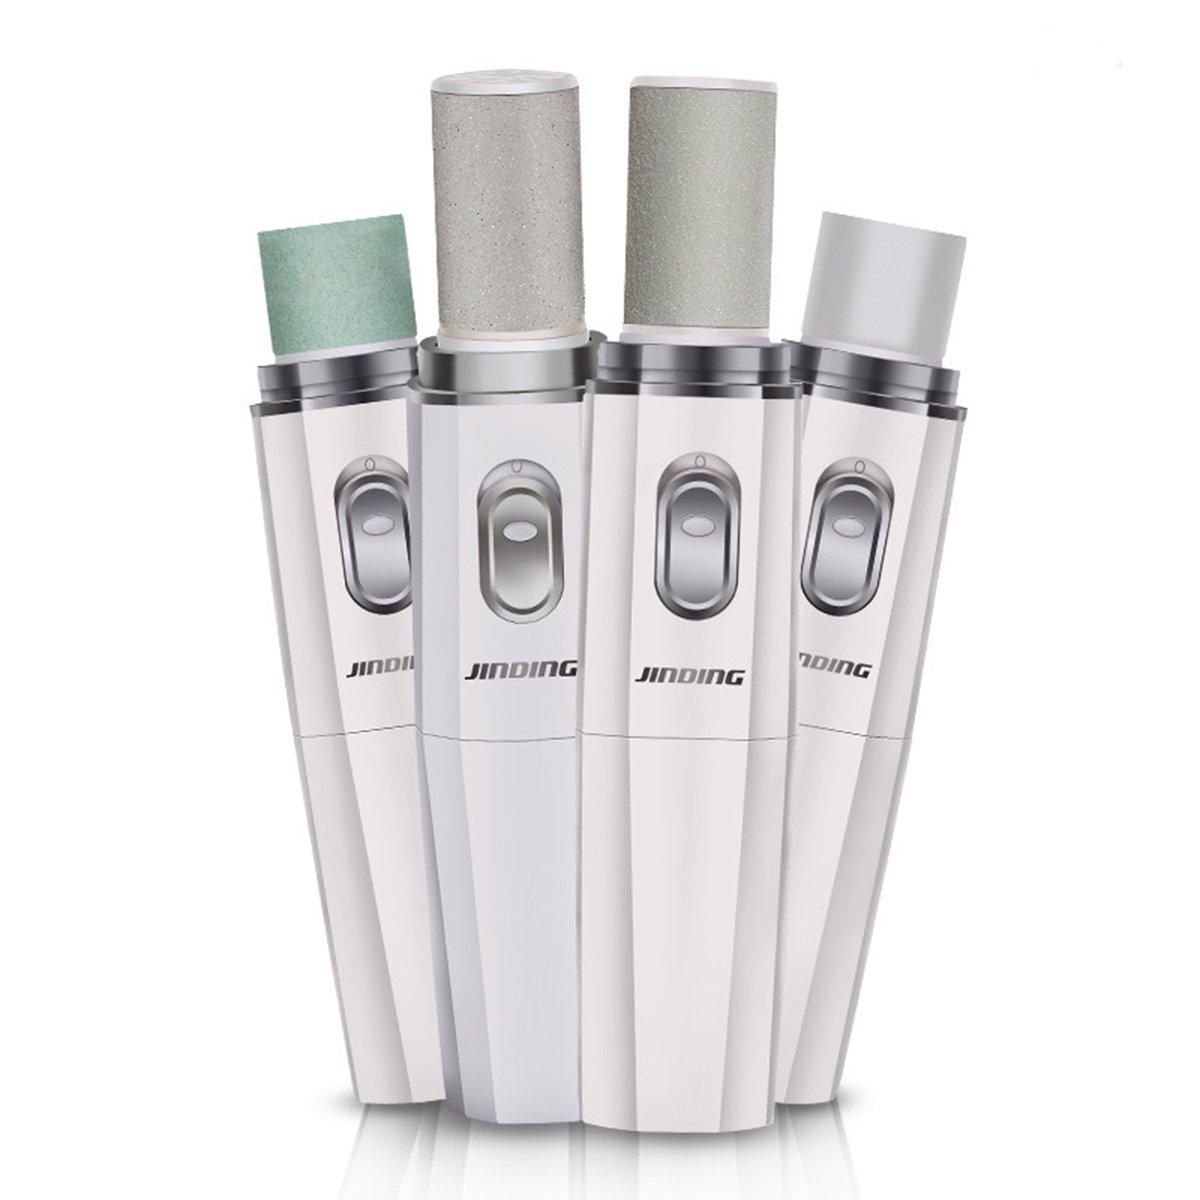 easywin Electric足カルスリムーバーProfessional Nailファイラー&ネイルバッファ&ネイルポリッシャーホームマニキュアツールセットバッテリーPowered ホワイト SJ-605 B01M35SVZ8 ホワイト